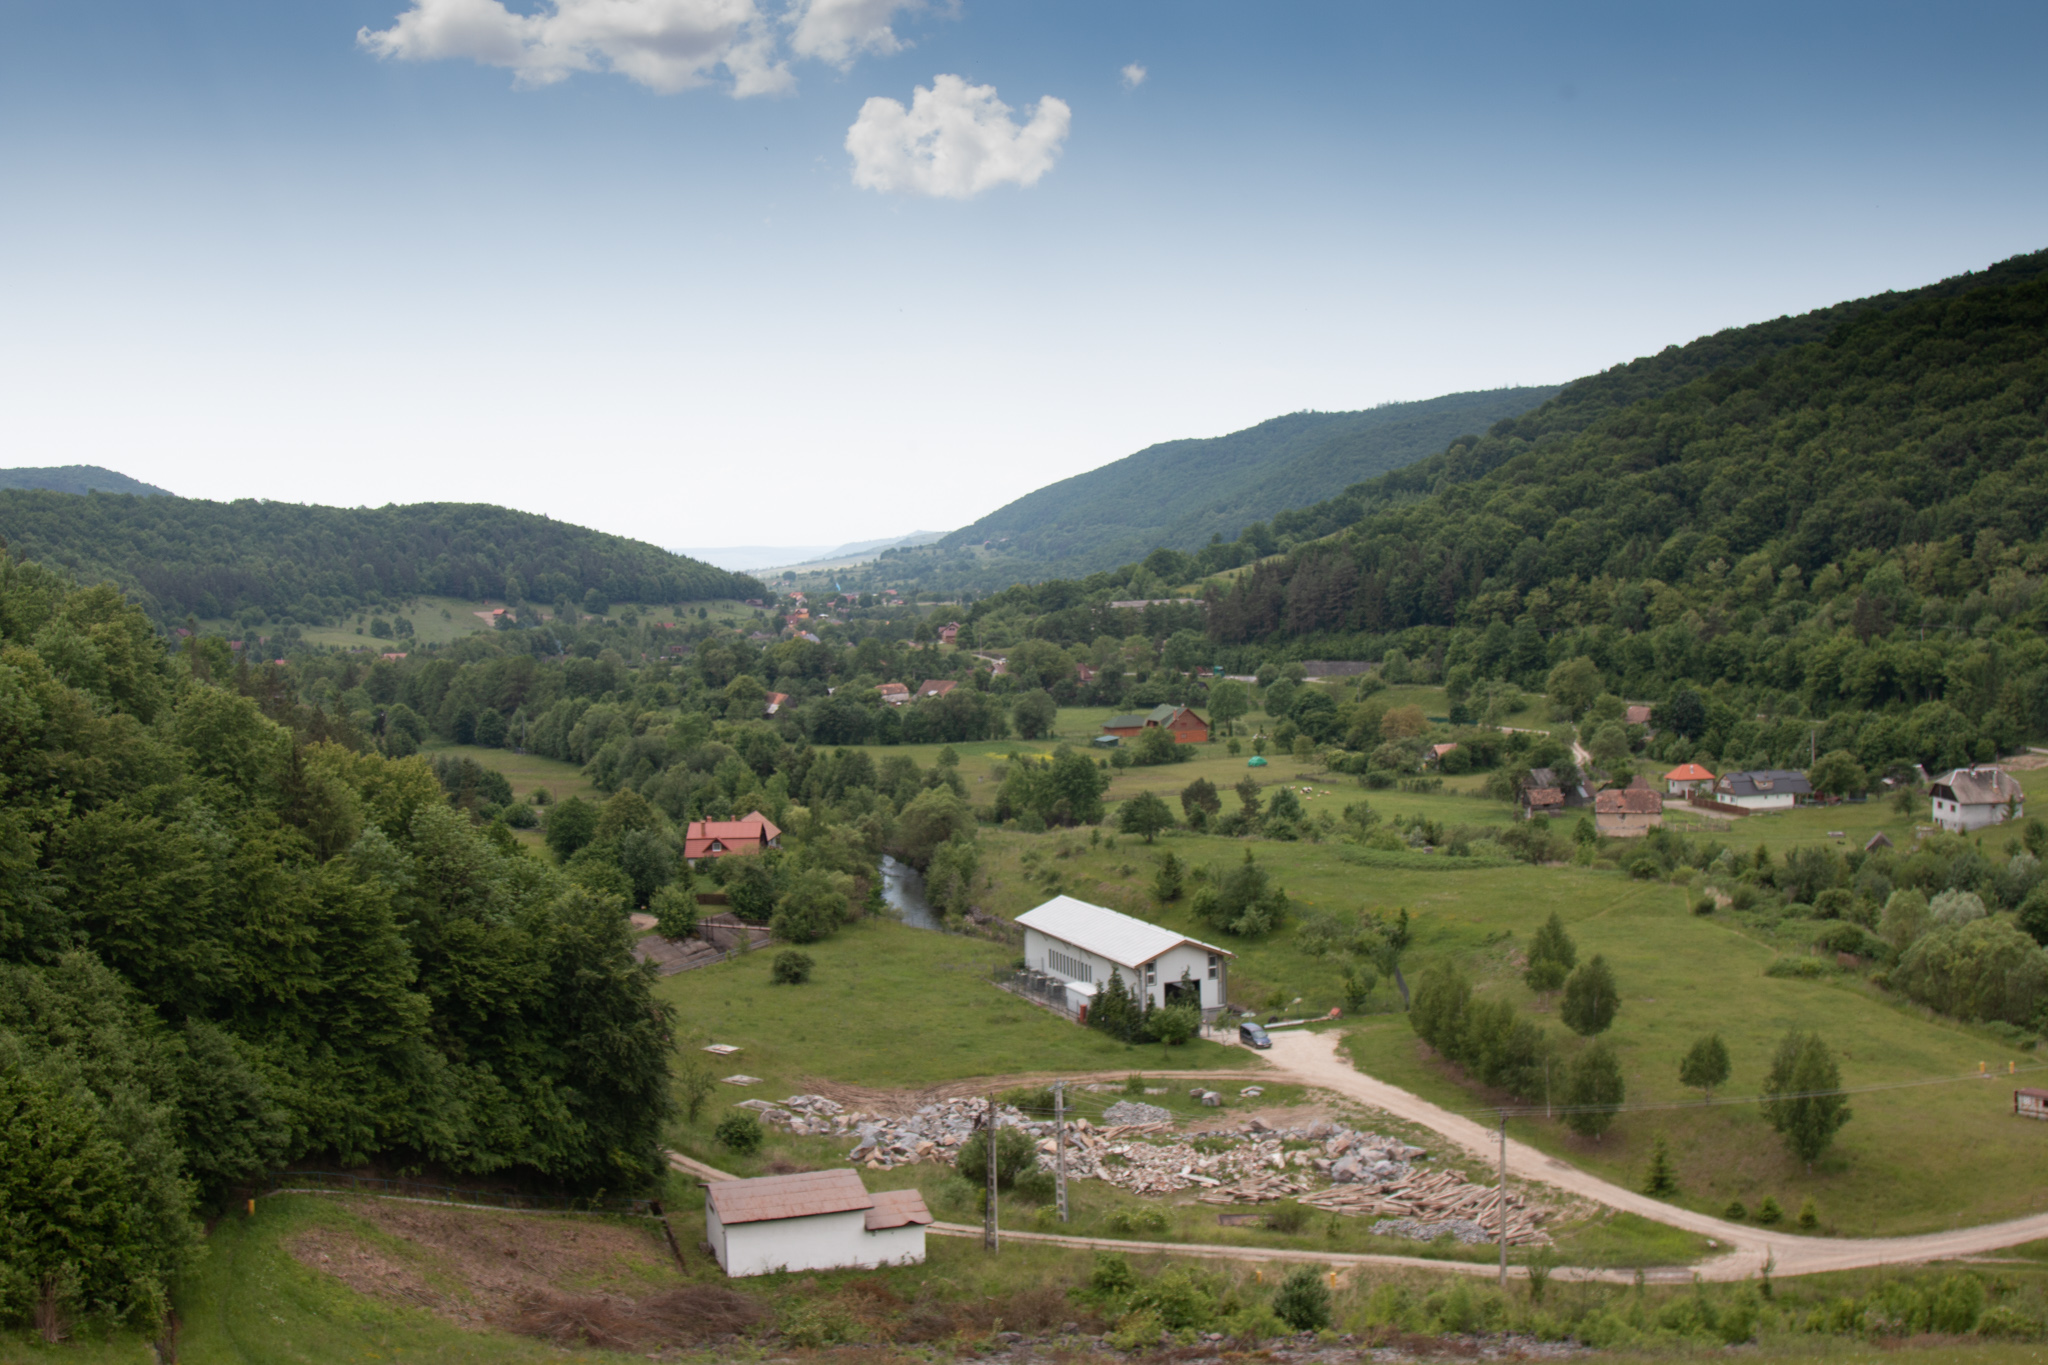 Landscape from Zetea Dam